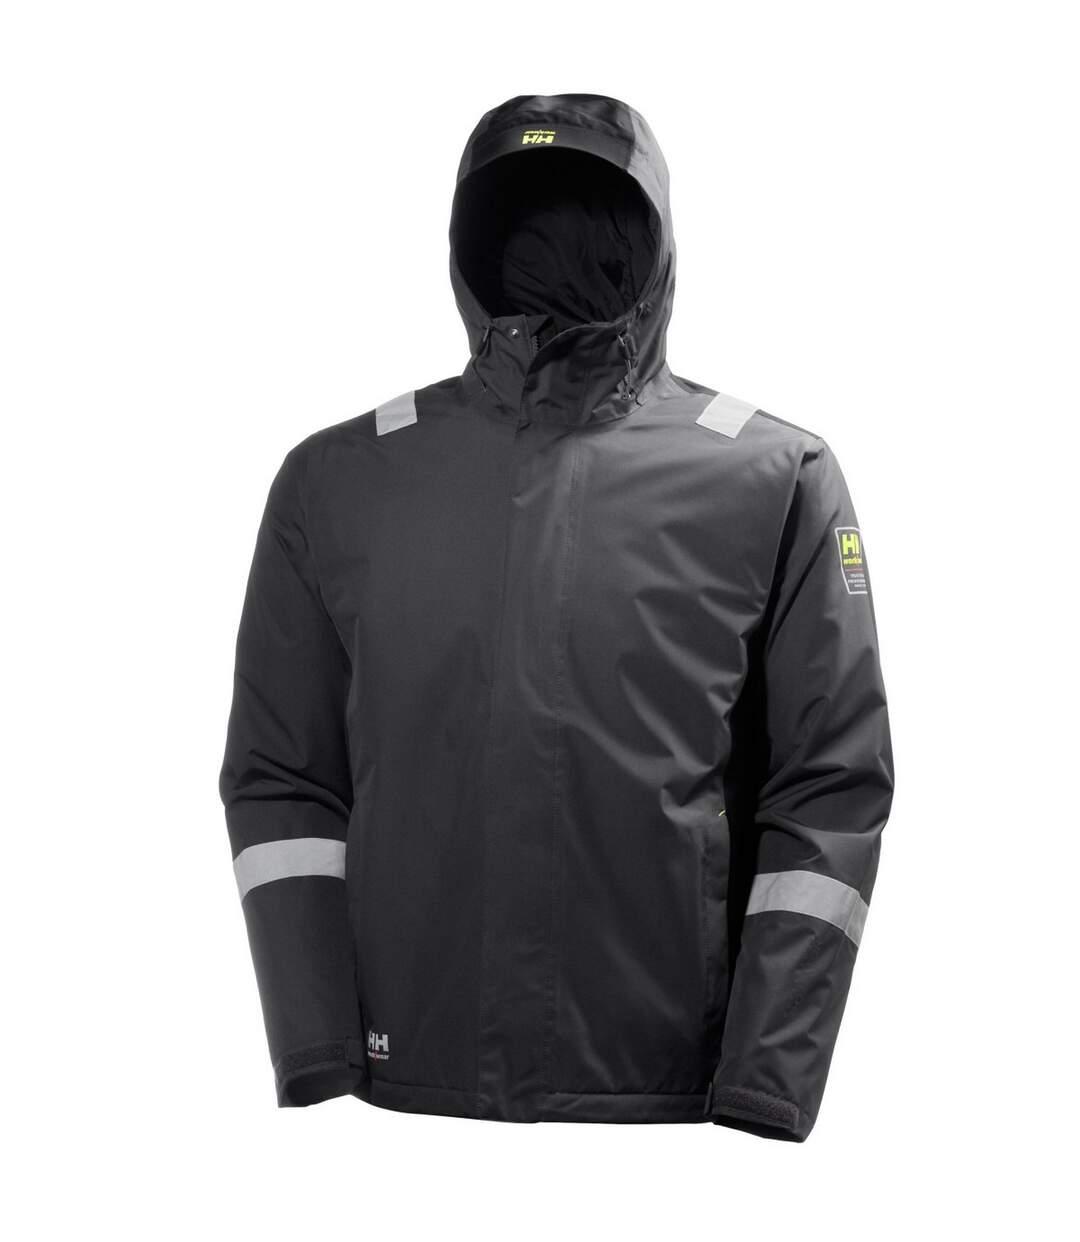 Helly Hansen Mens Aker Winter Jacket (Slate Grey/Black) - UTBC3946